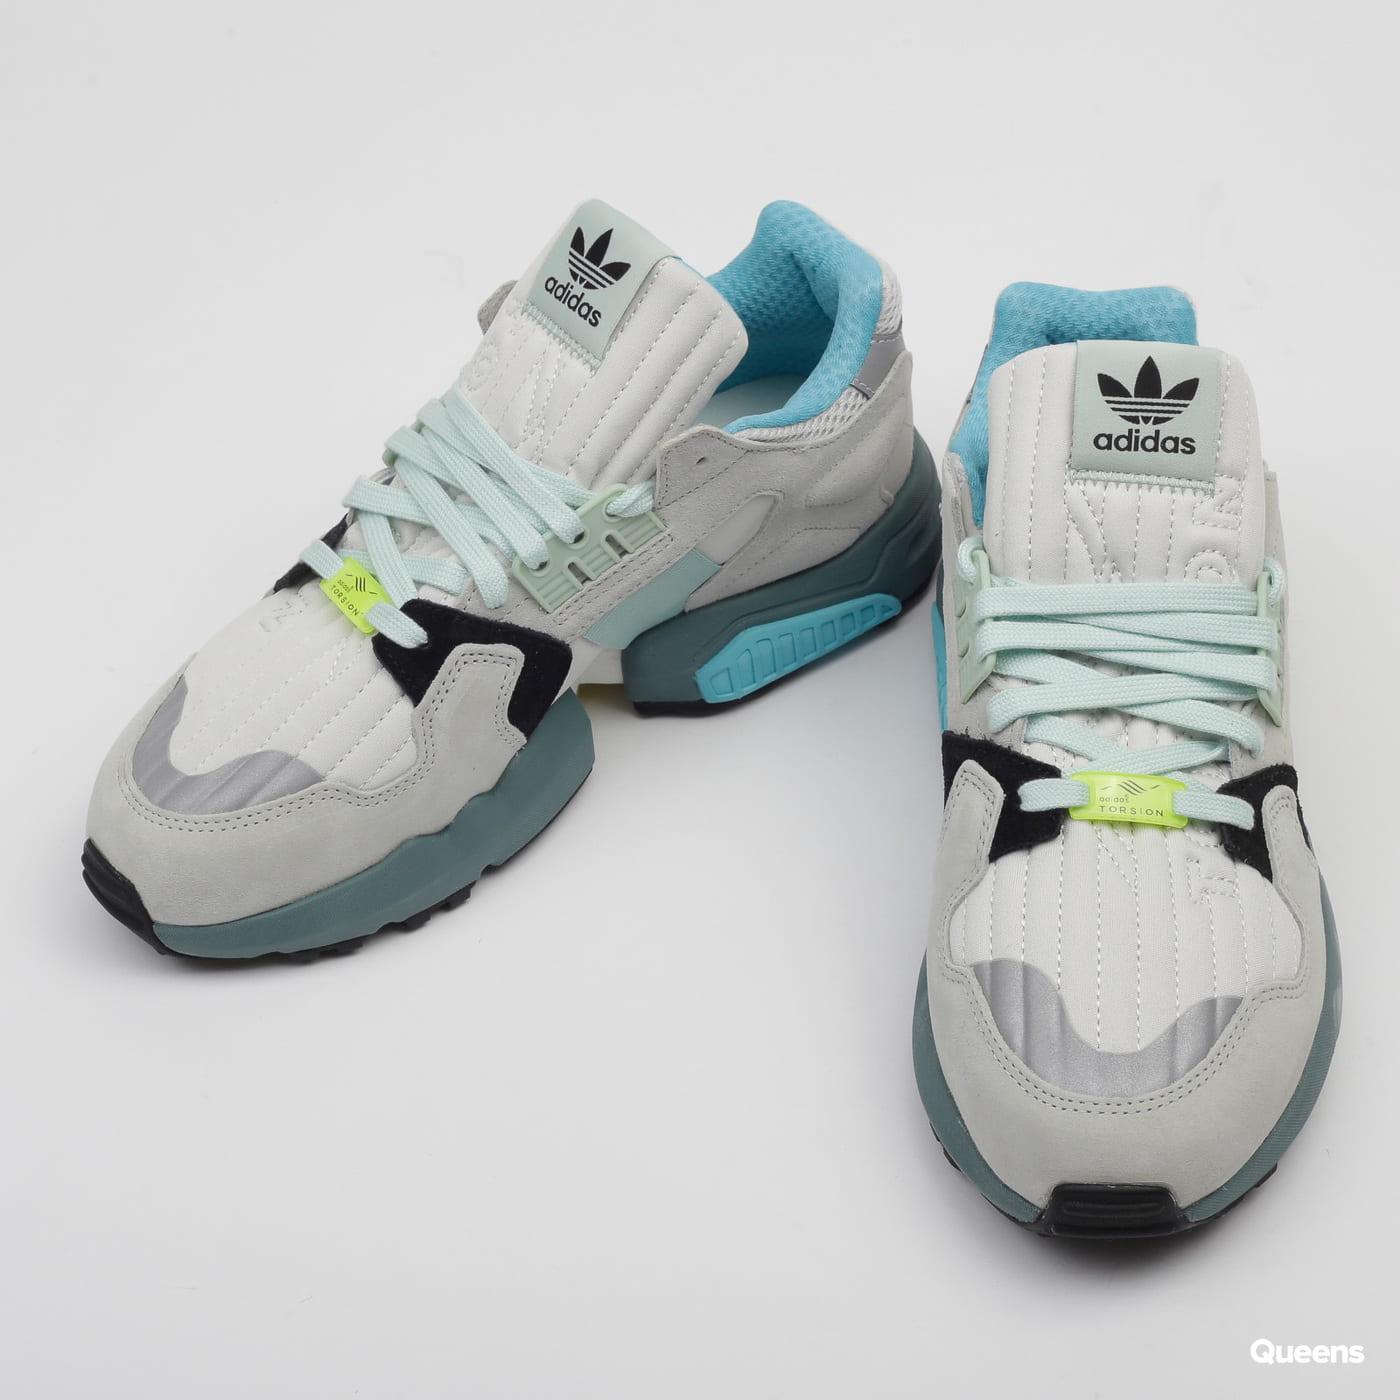 adidas Originals ZX Torsion orbgry / blublo / cblack